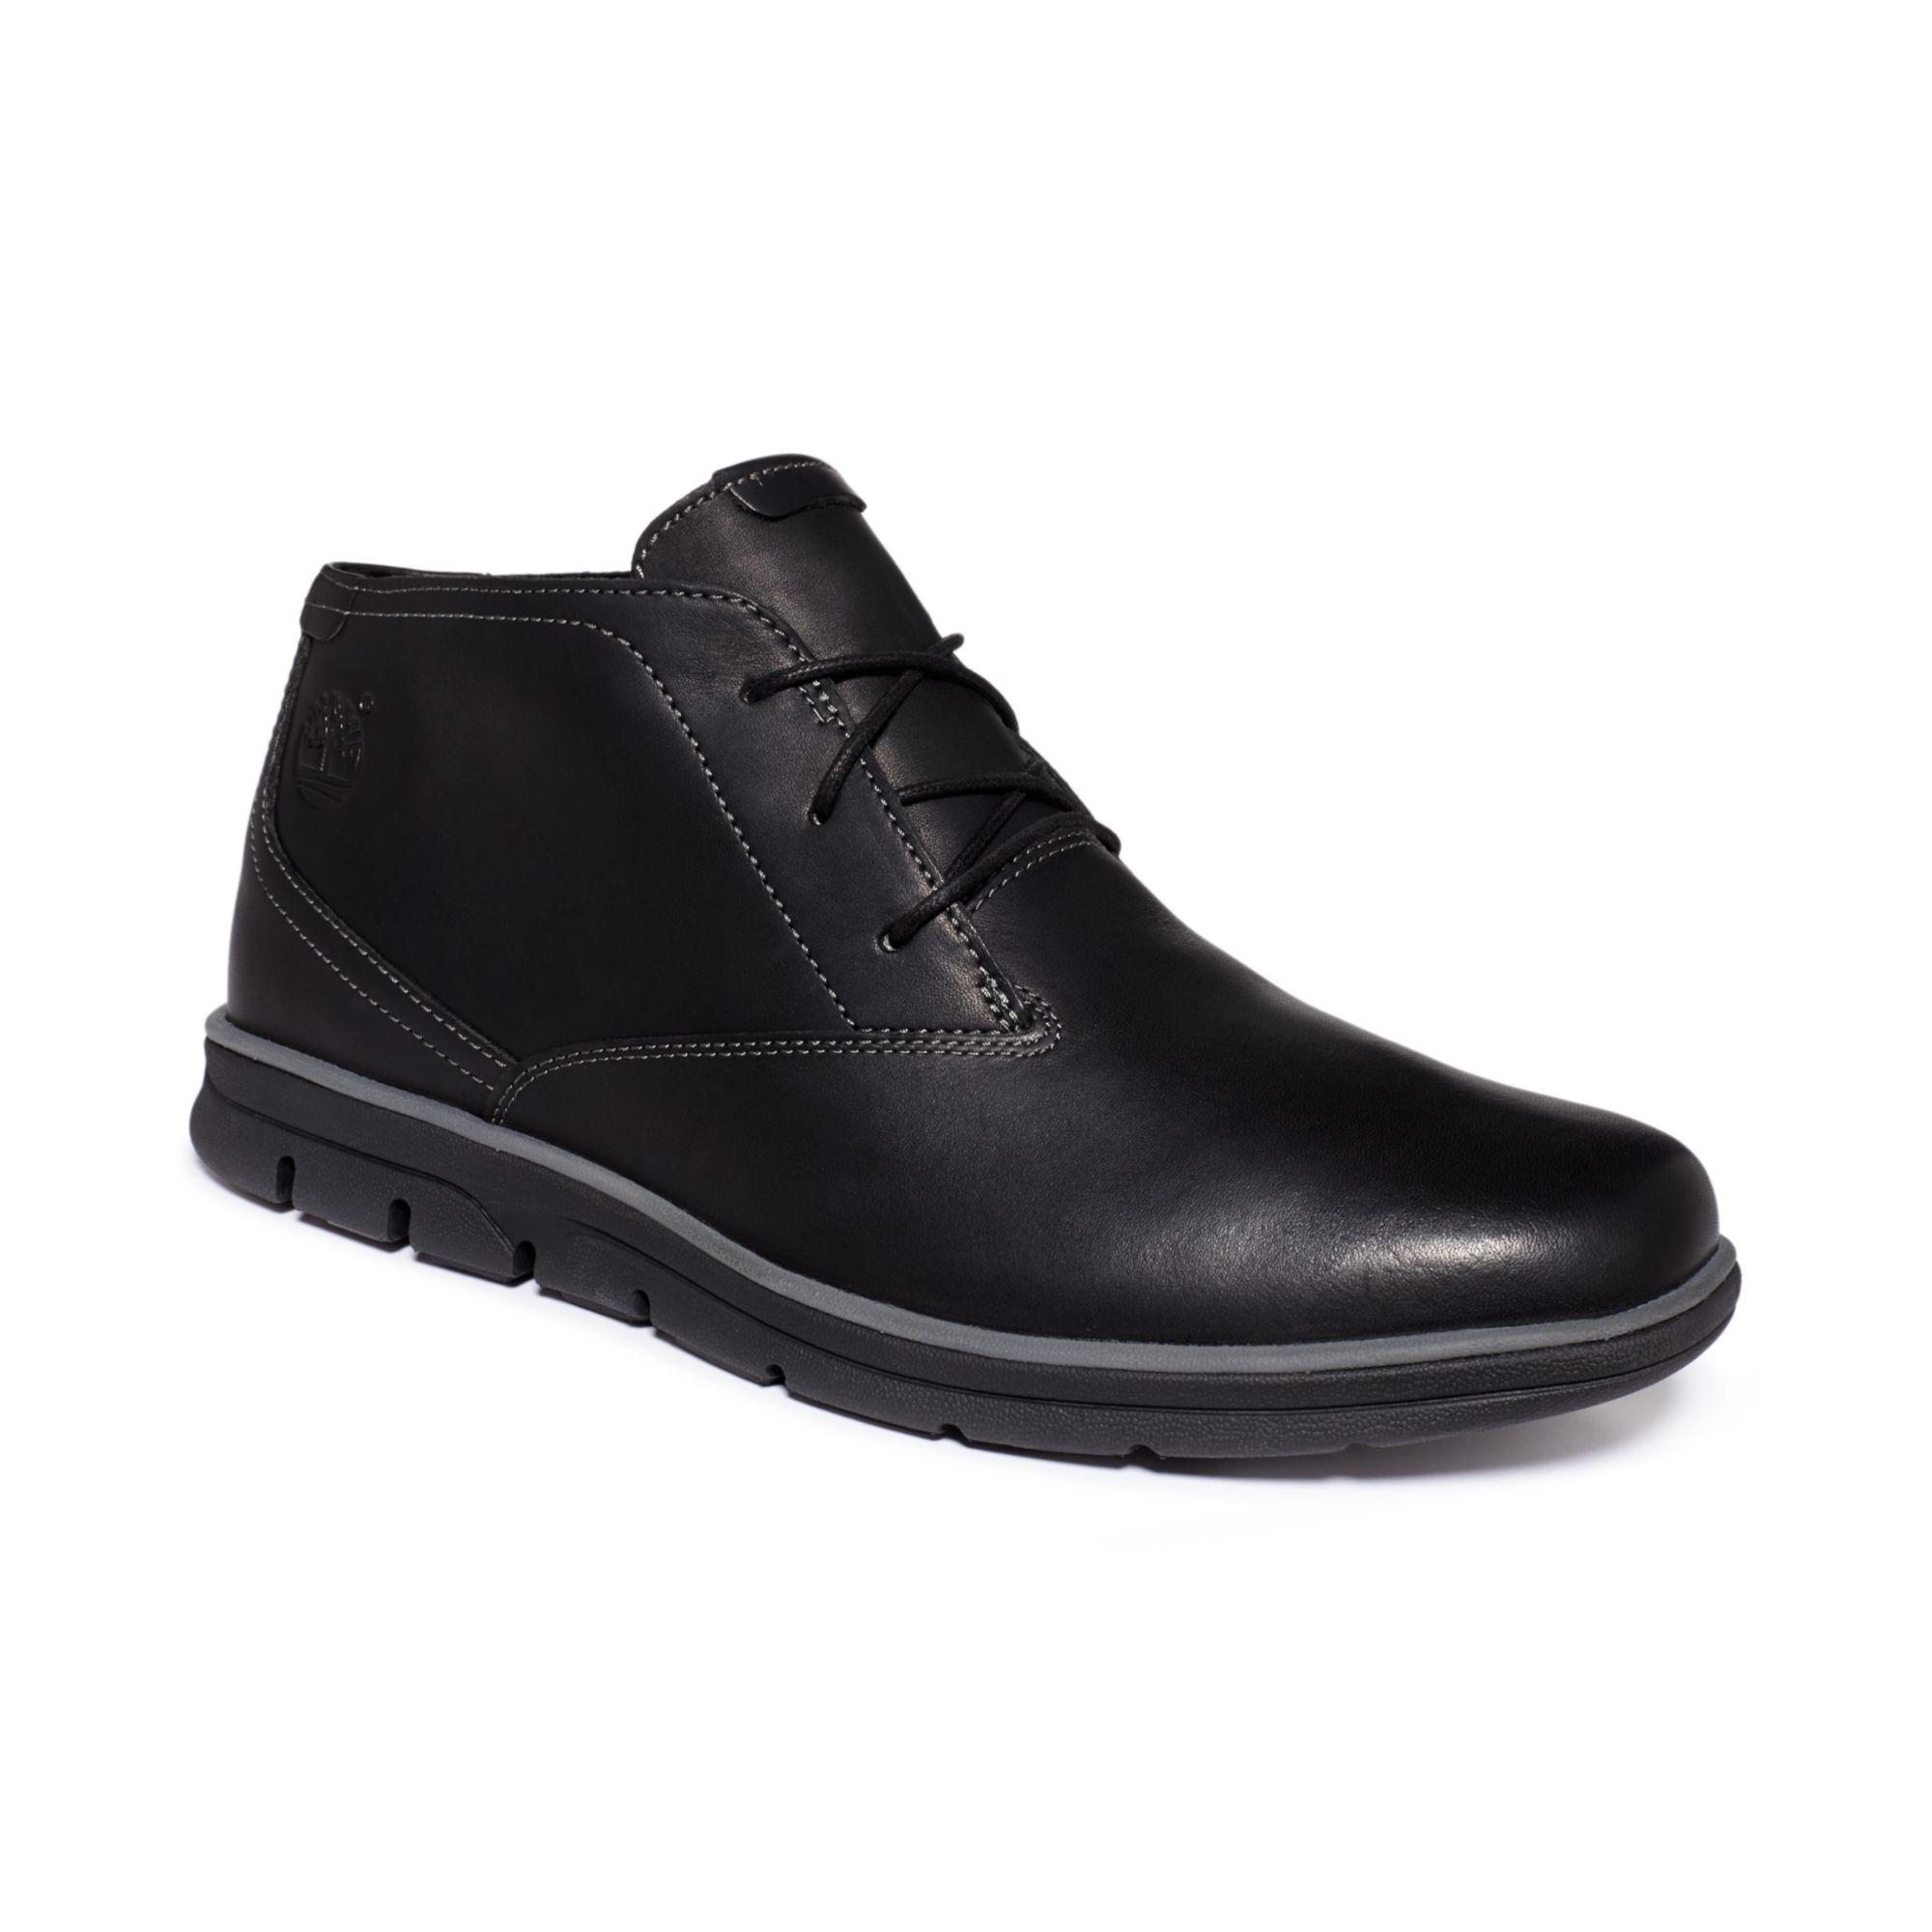 timberland bradstreet plain toe chukka boots in black for